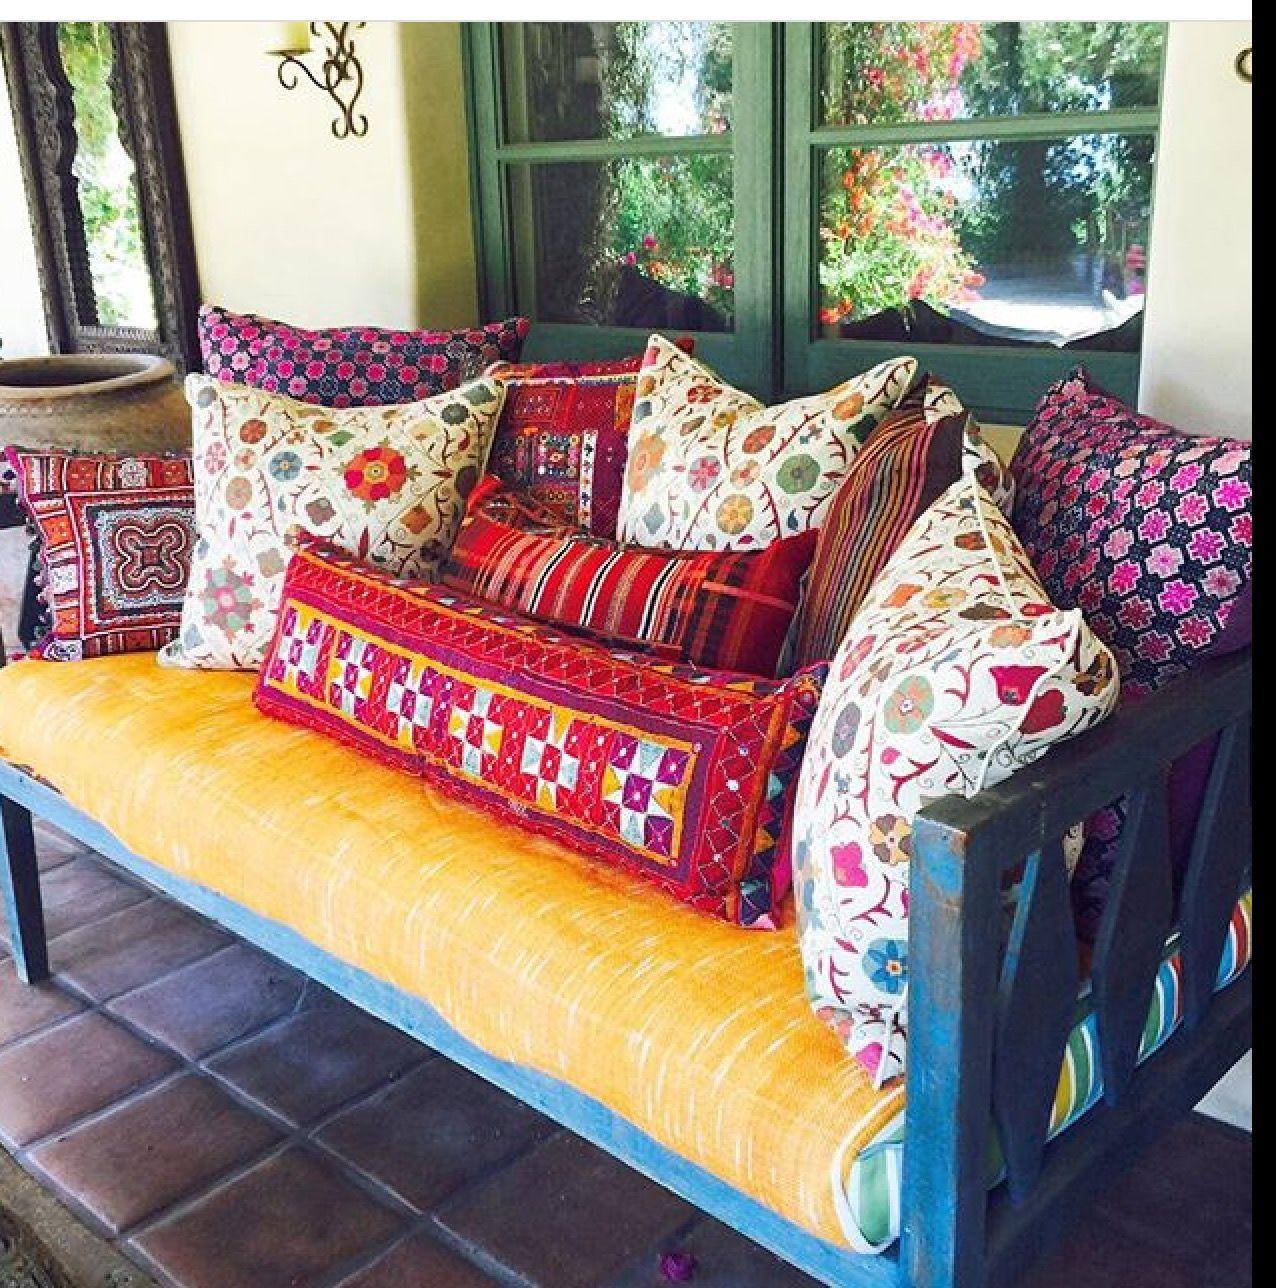 Kathryn M Ireland Decor, Home decor, Outdoor decor